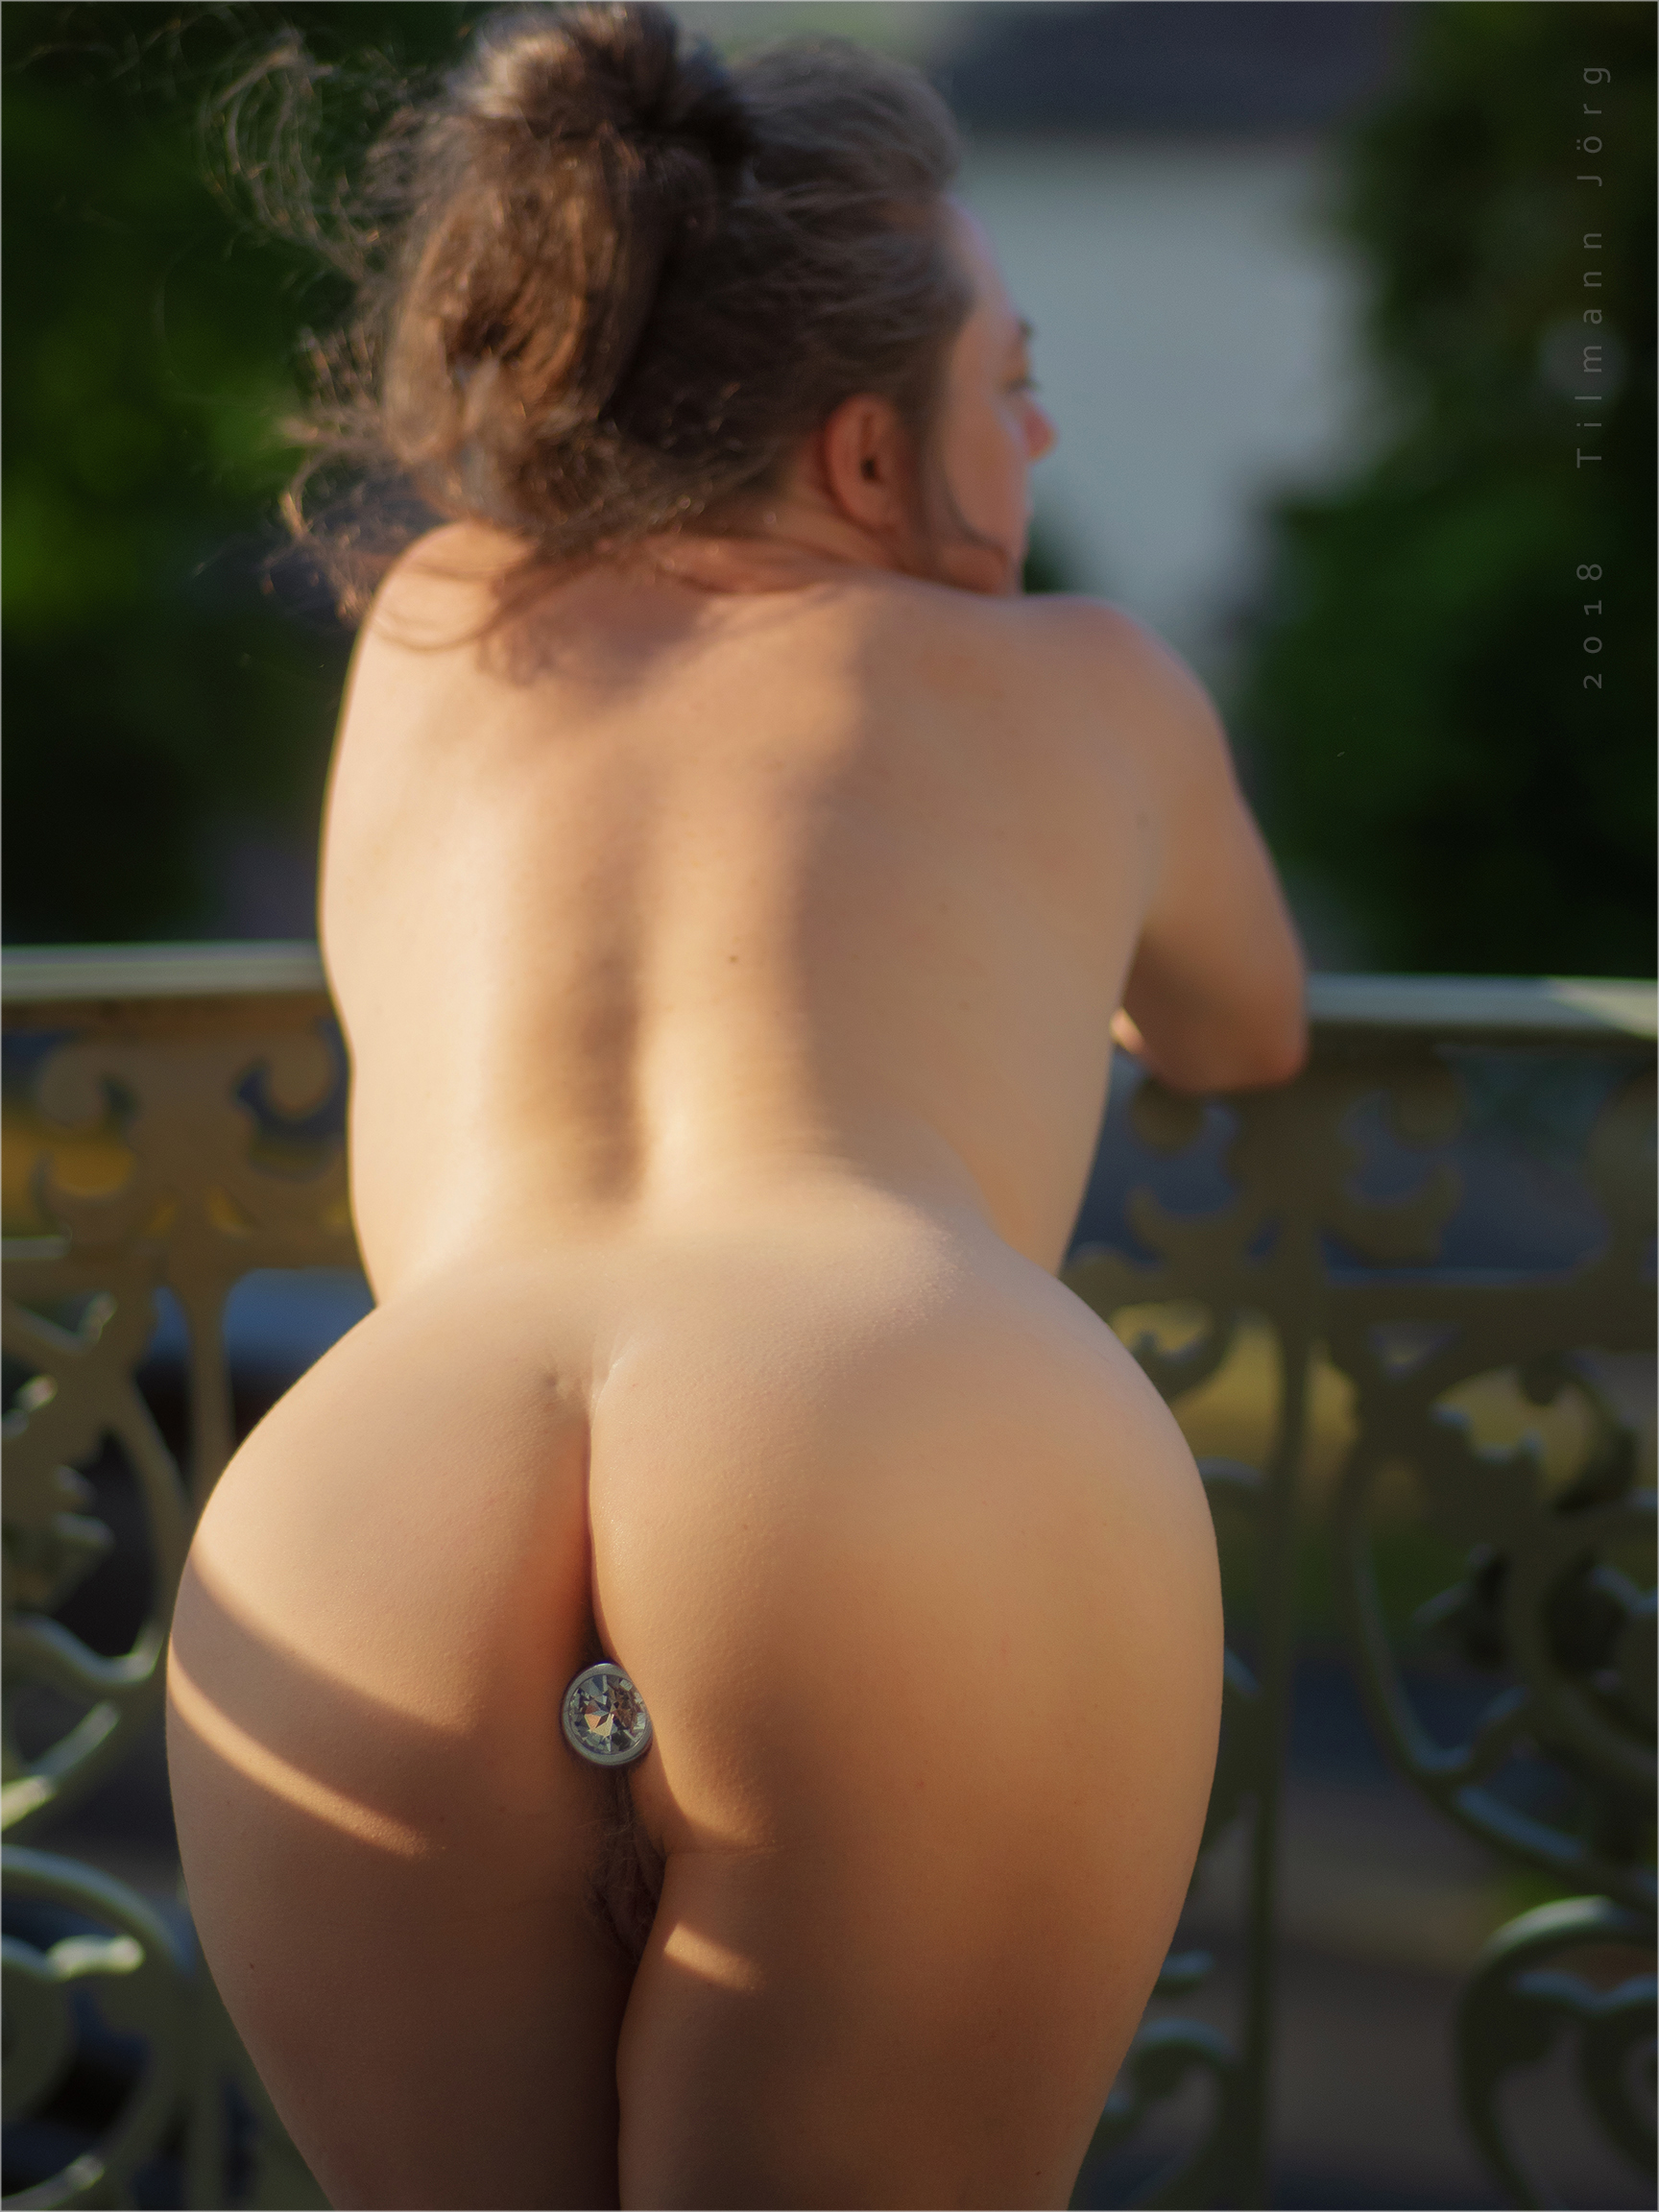 nackte frau mit plug im po auf dem balkon